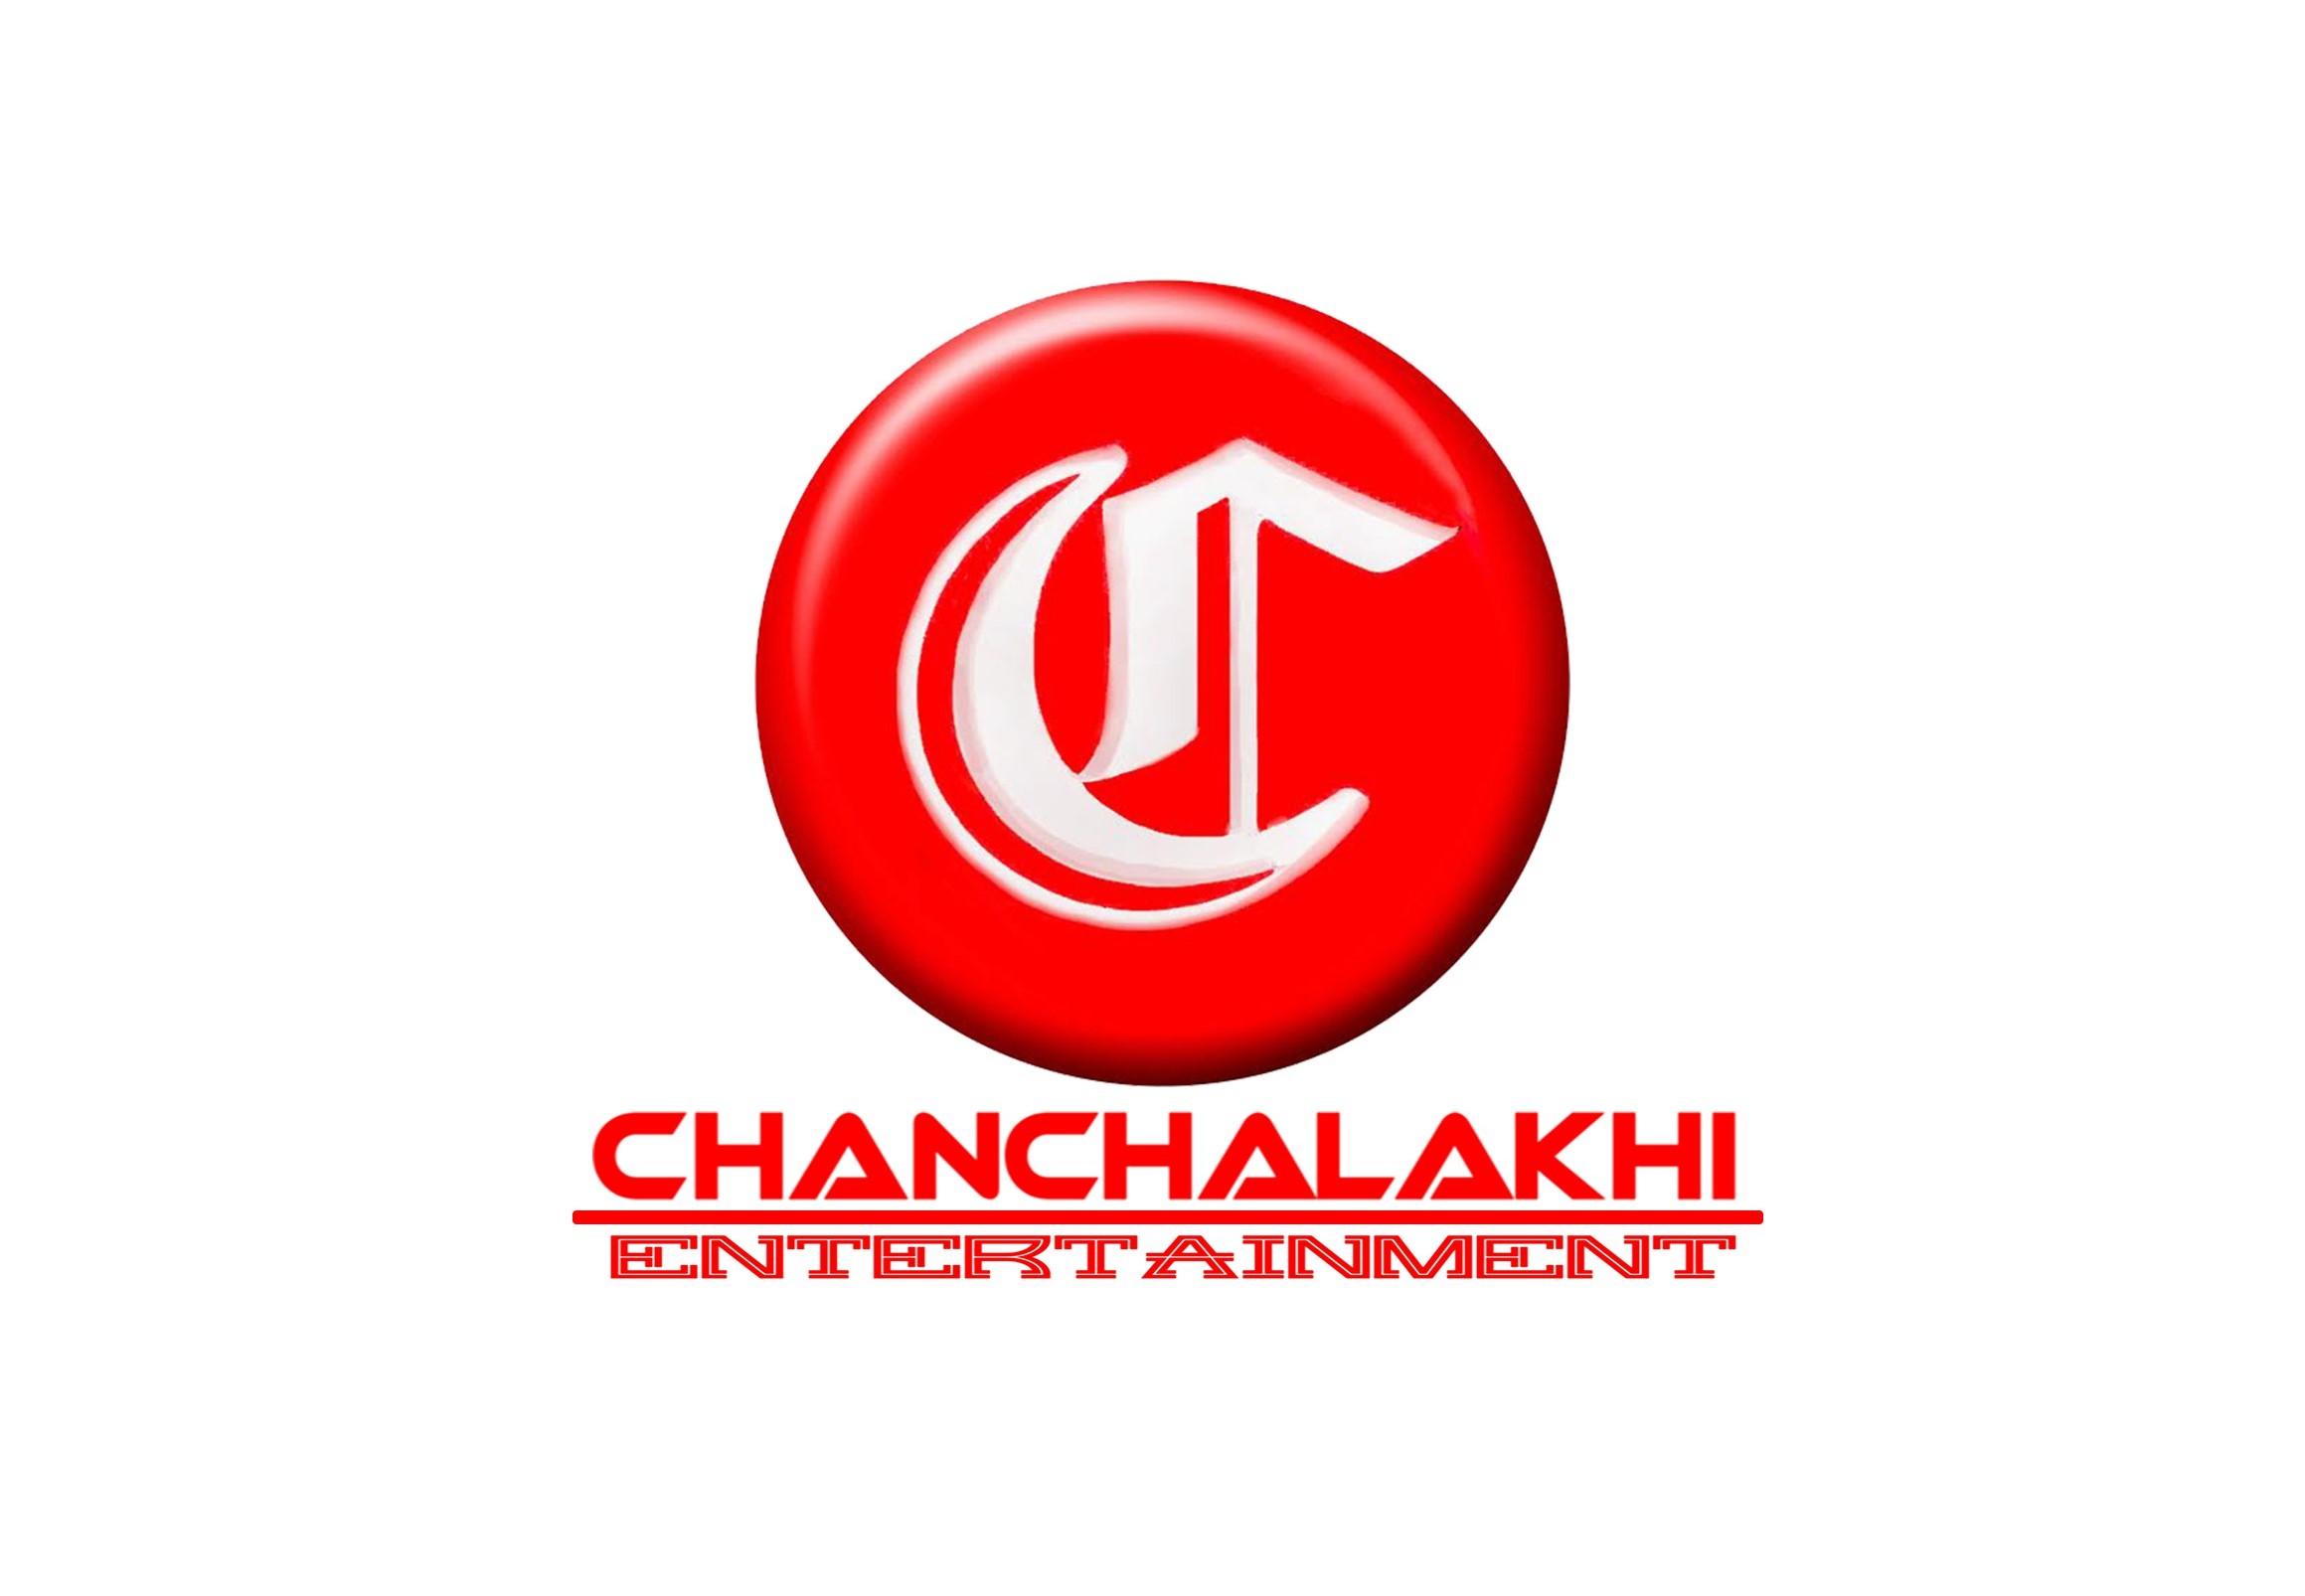 Chanchalakhi Entertainment